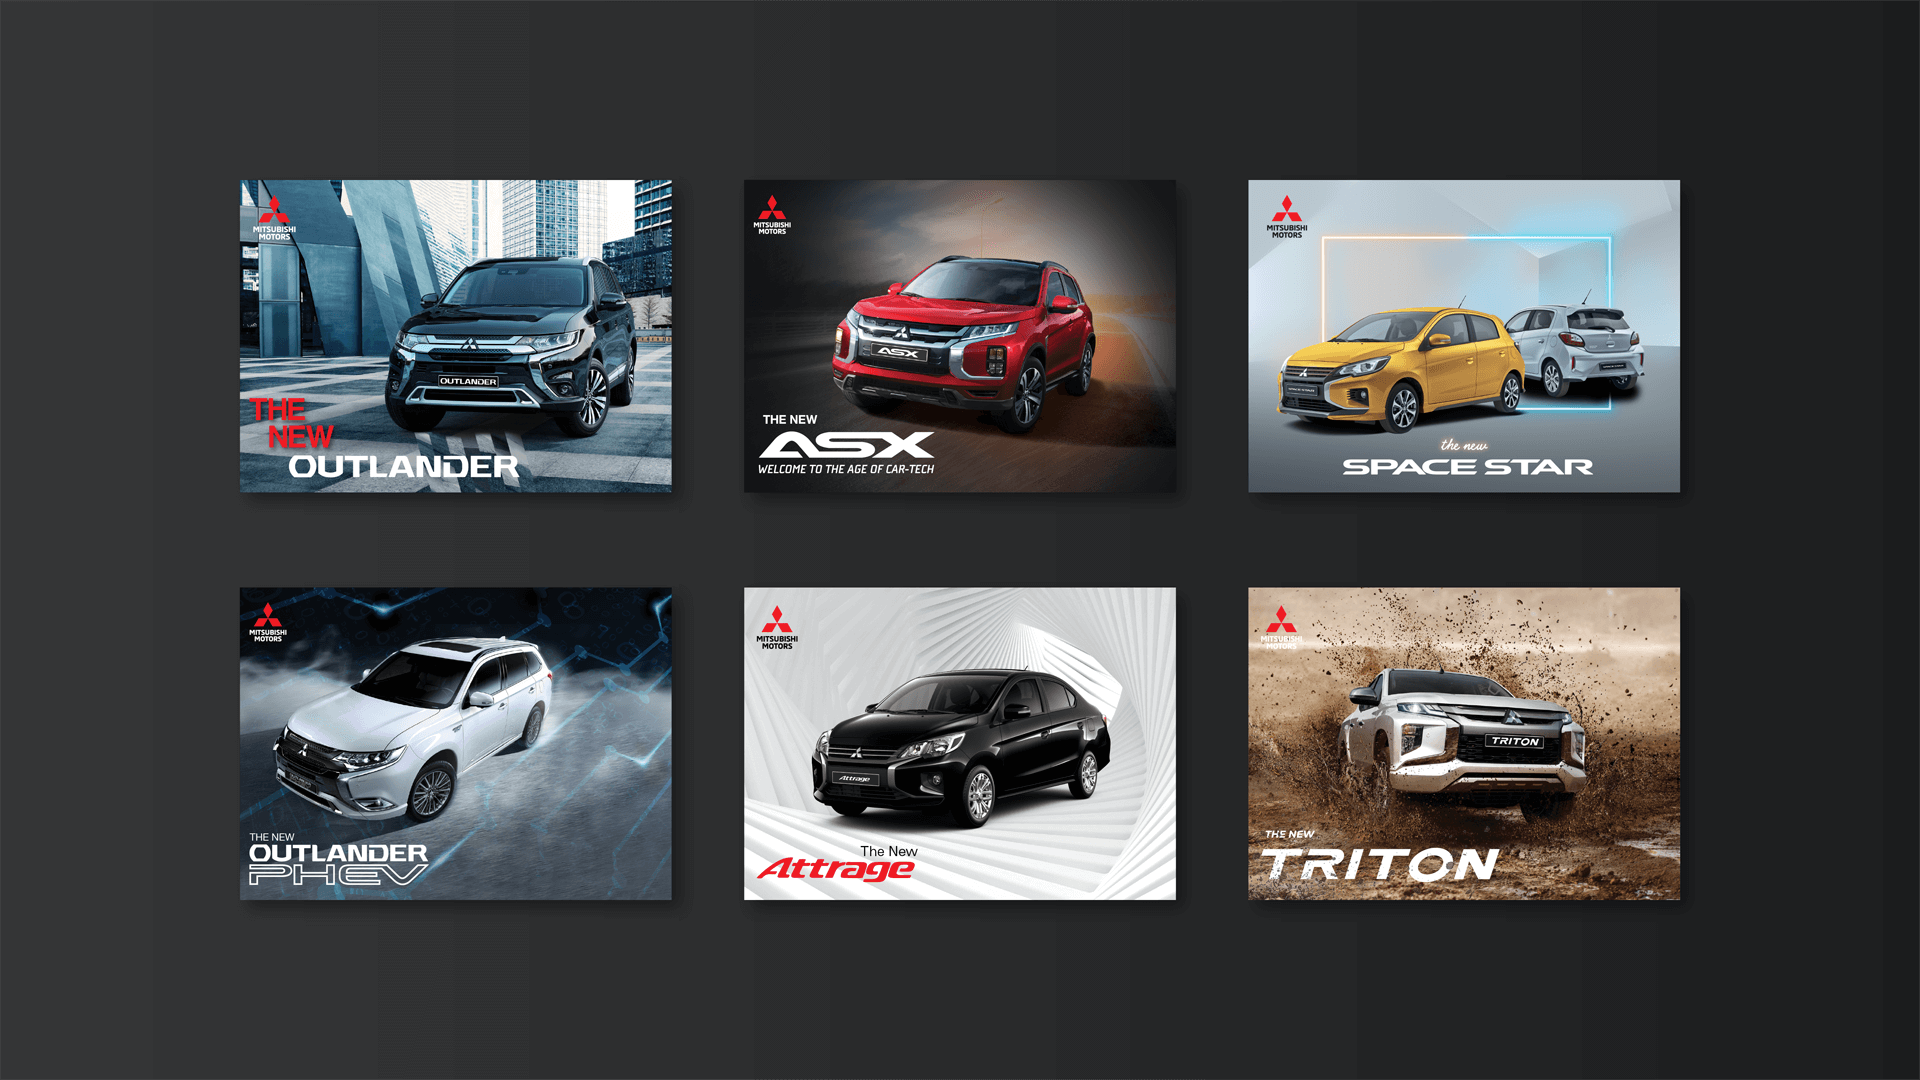 Mitsubishi catalogue covers